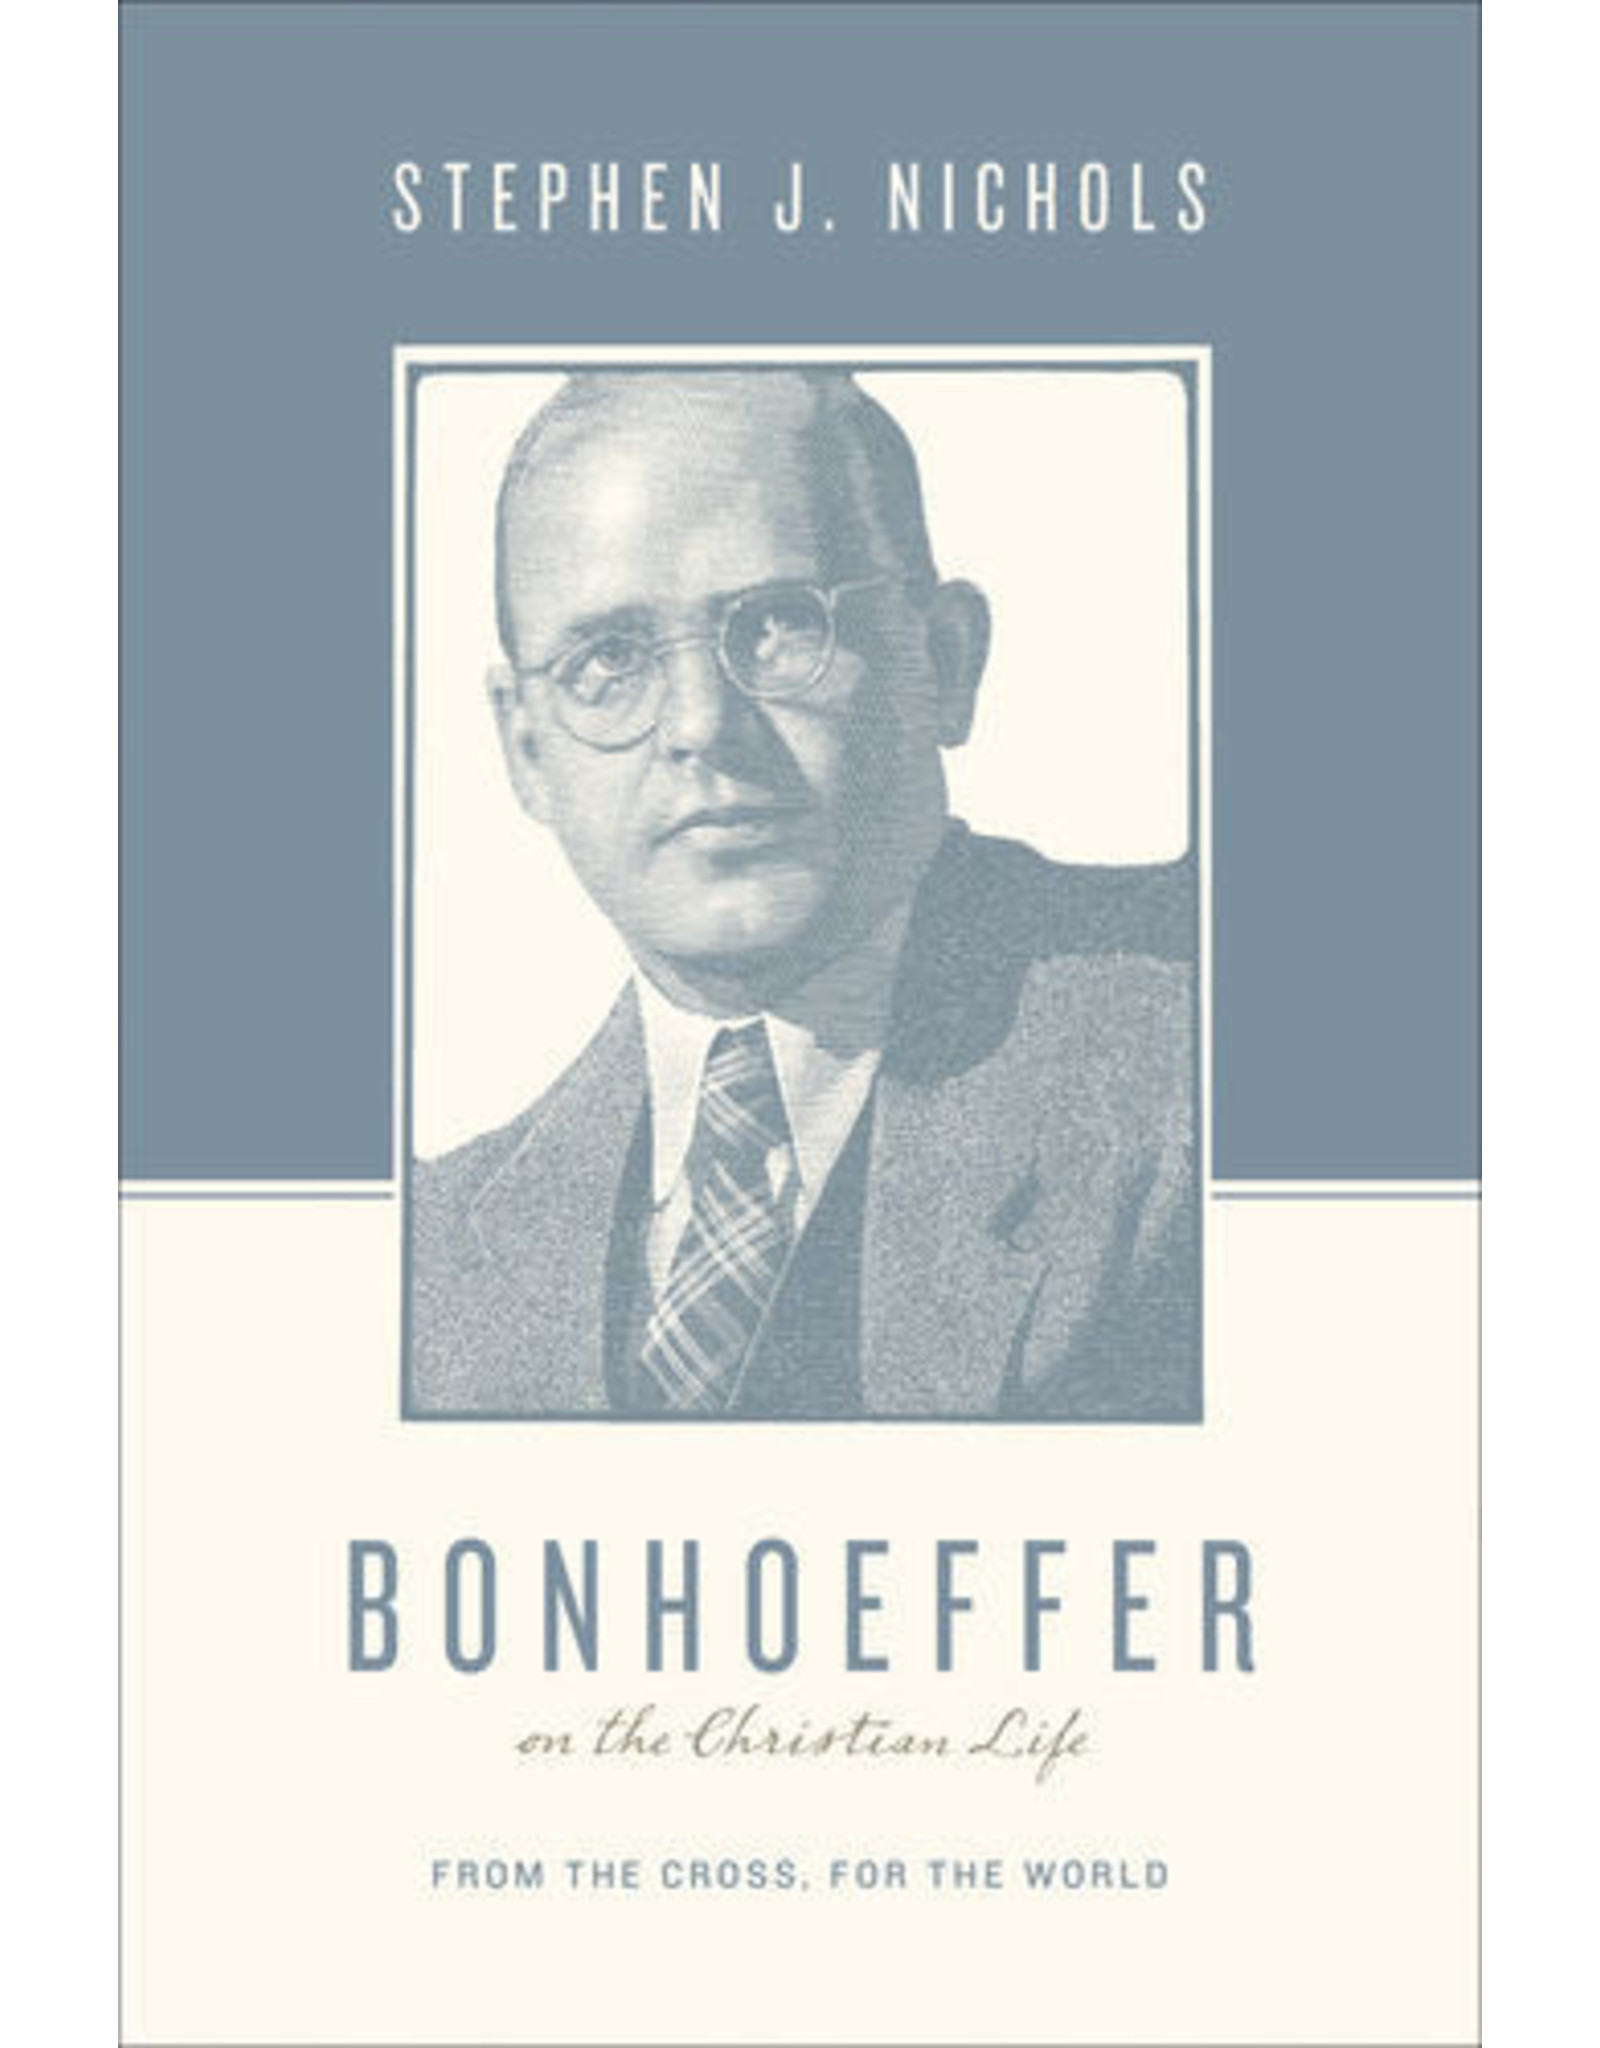 Nichols Bonhoeffer on the Christian Life